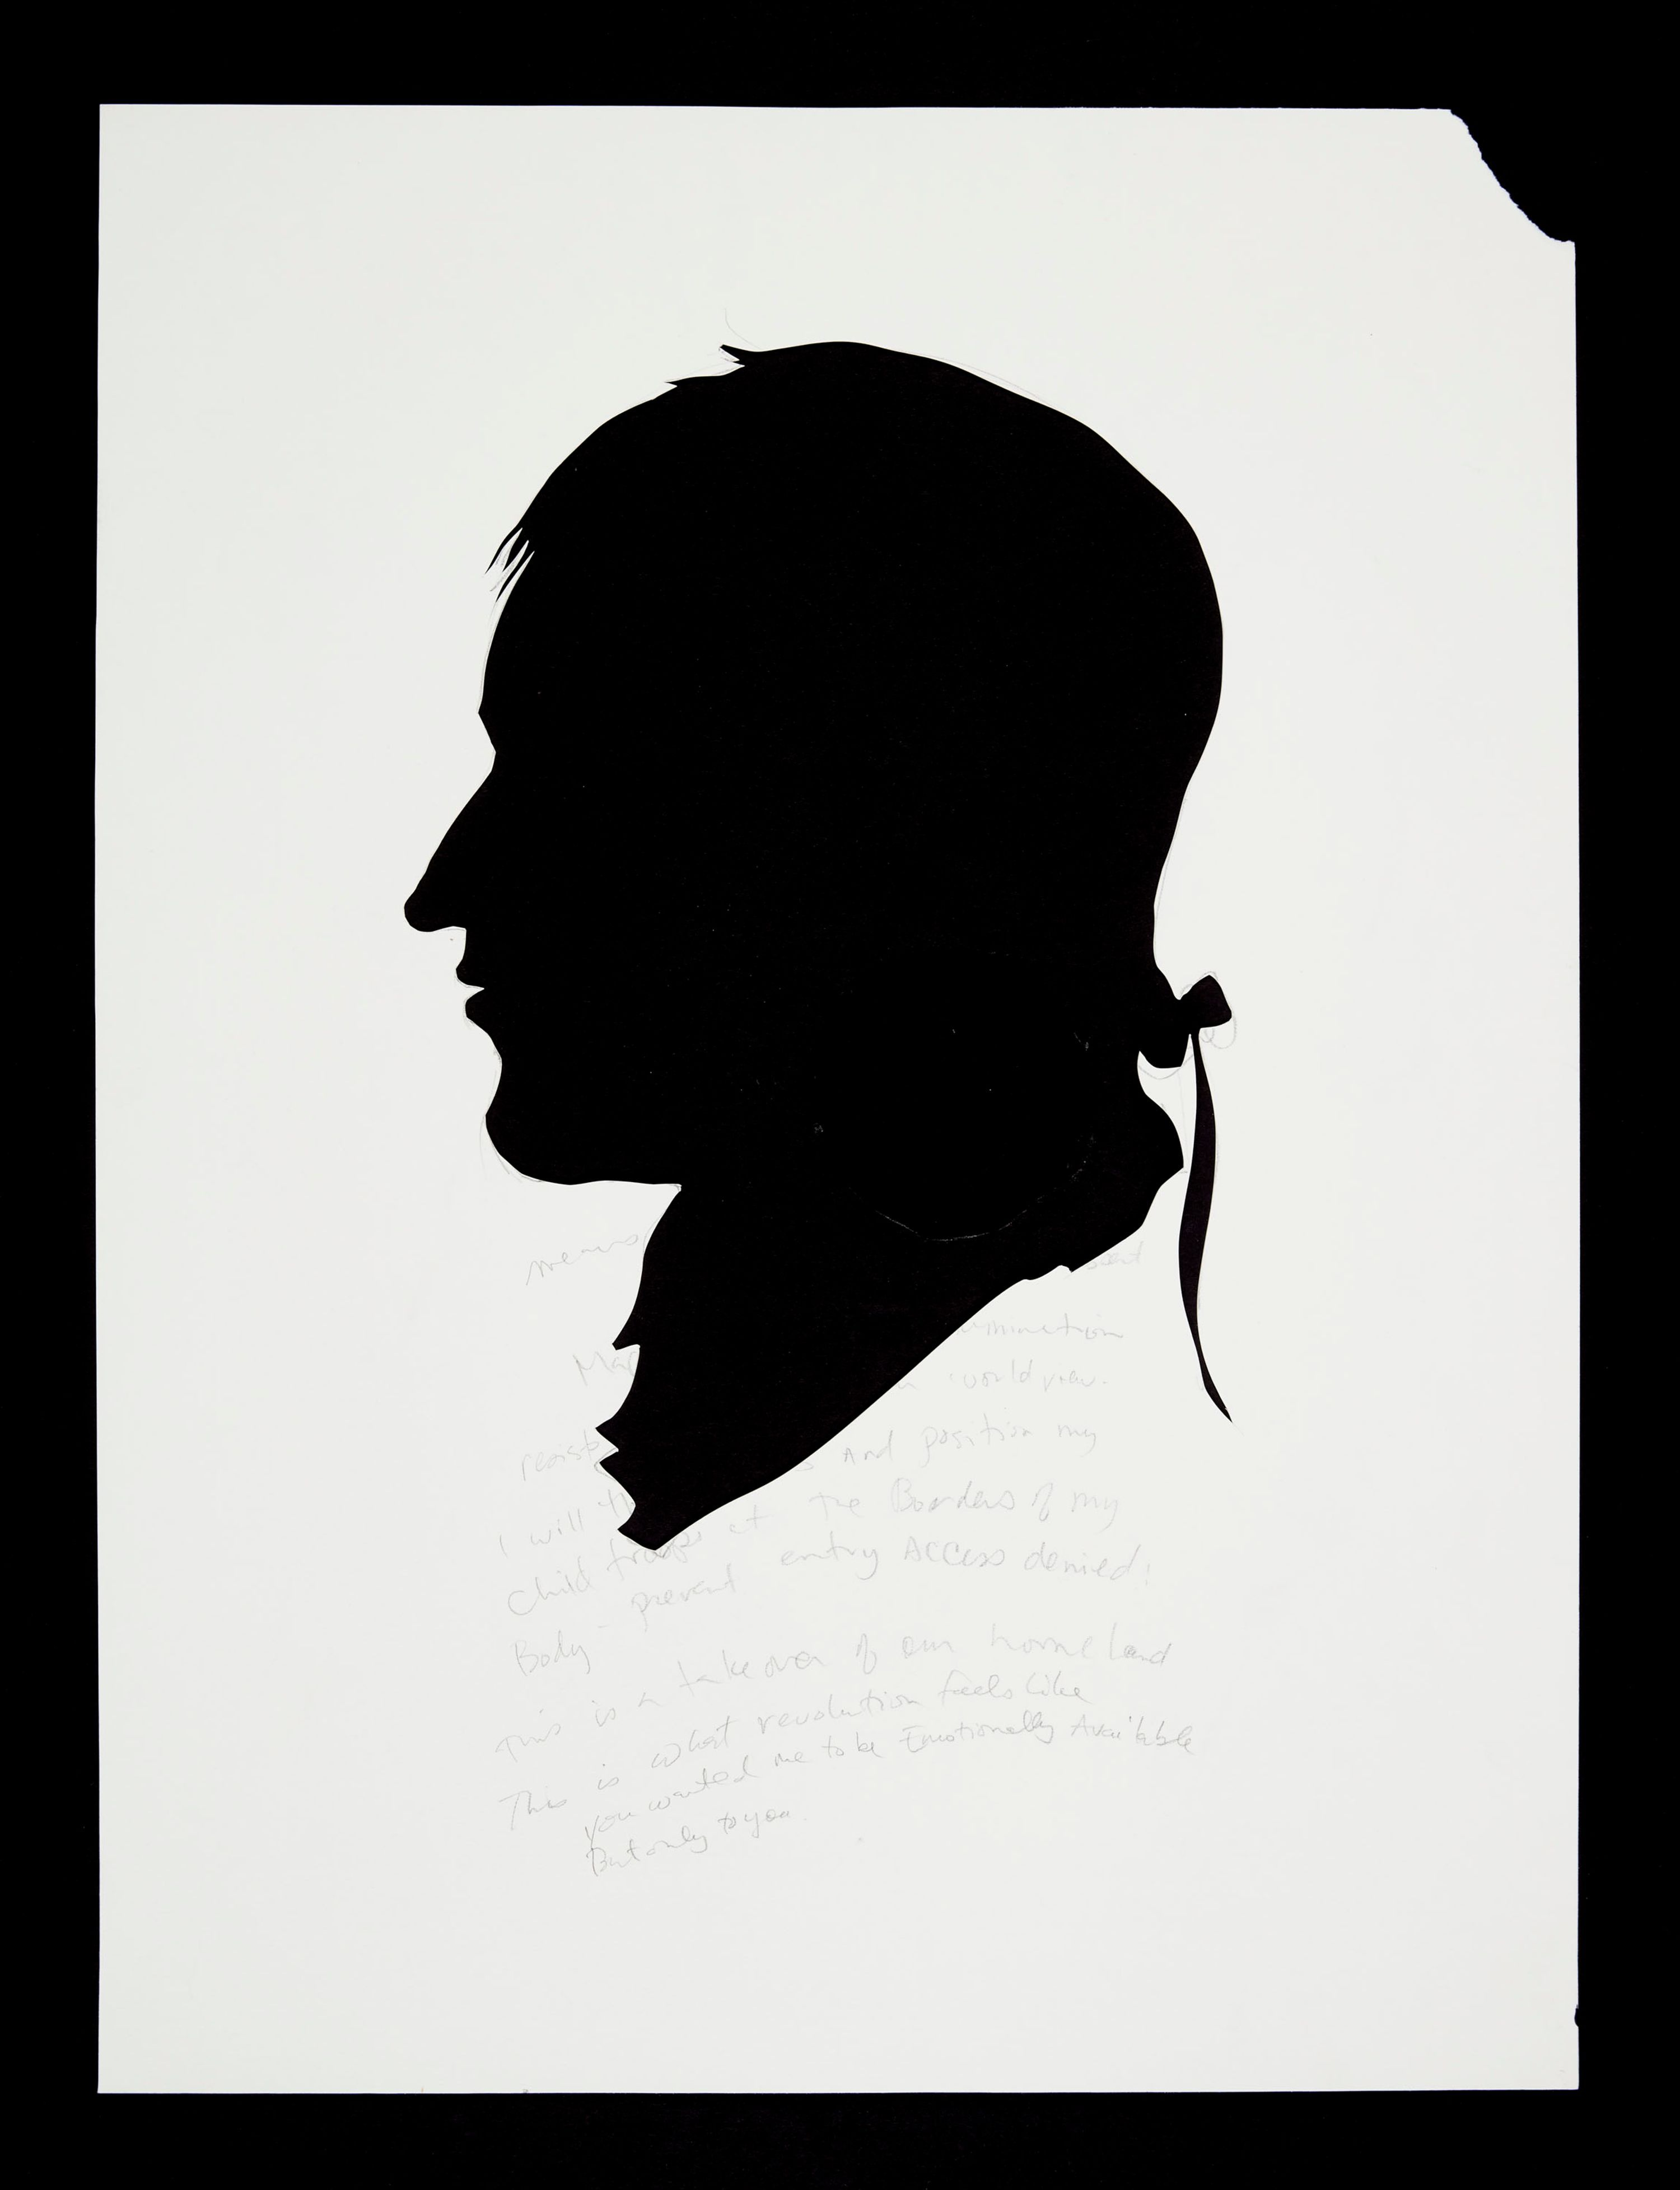 Kara Walker Untitled, n.d. Cut paper 25.75 x 19 inches (65.4 x 48.3 cm)